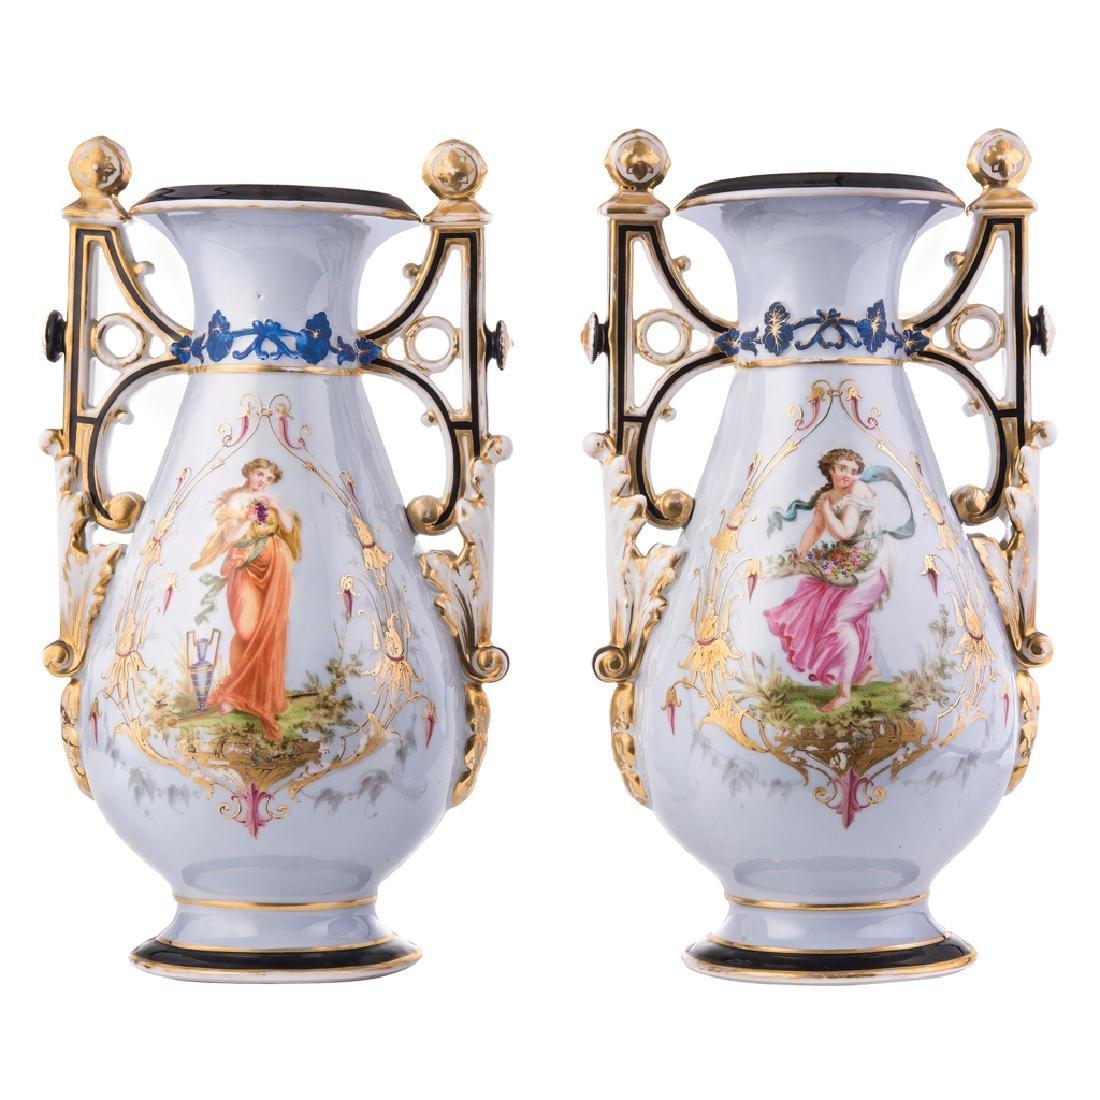 A PAIR OF VASES. AUSTRIA, 19th CENTURY. Porcelain,